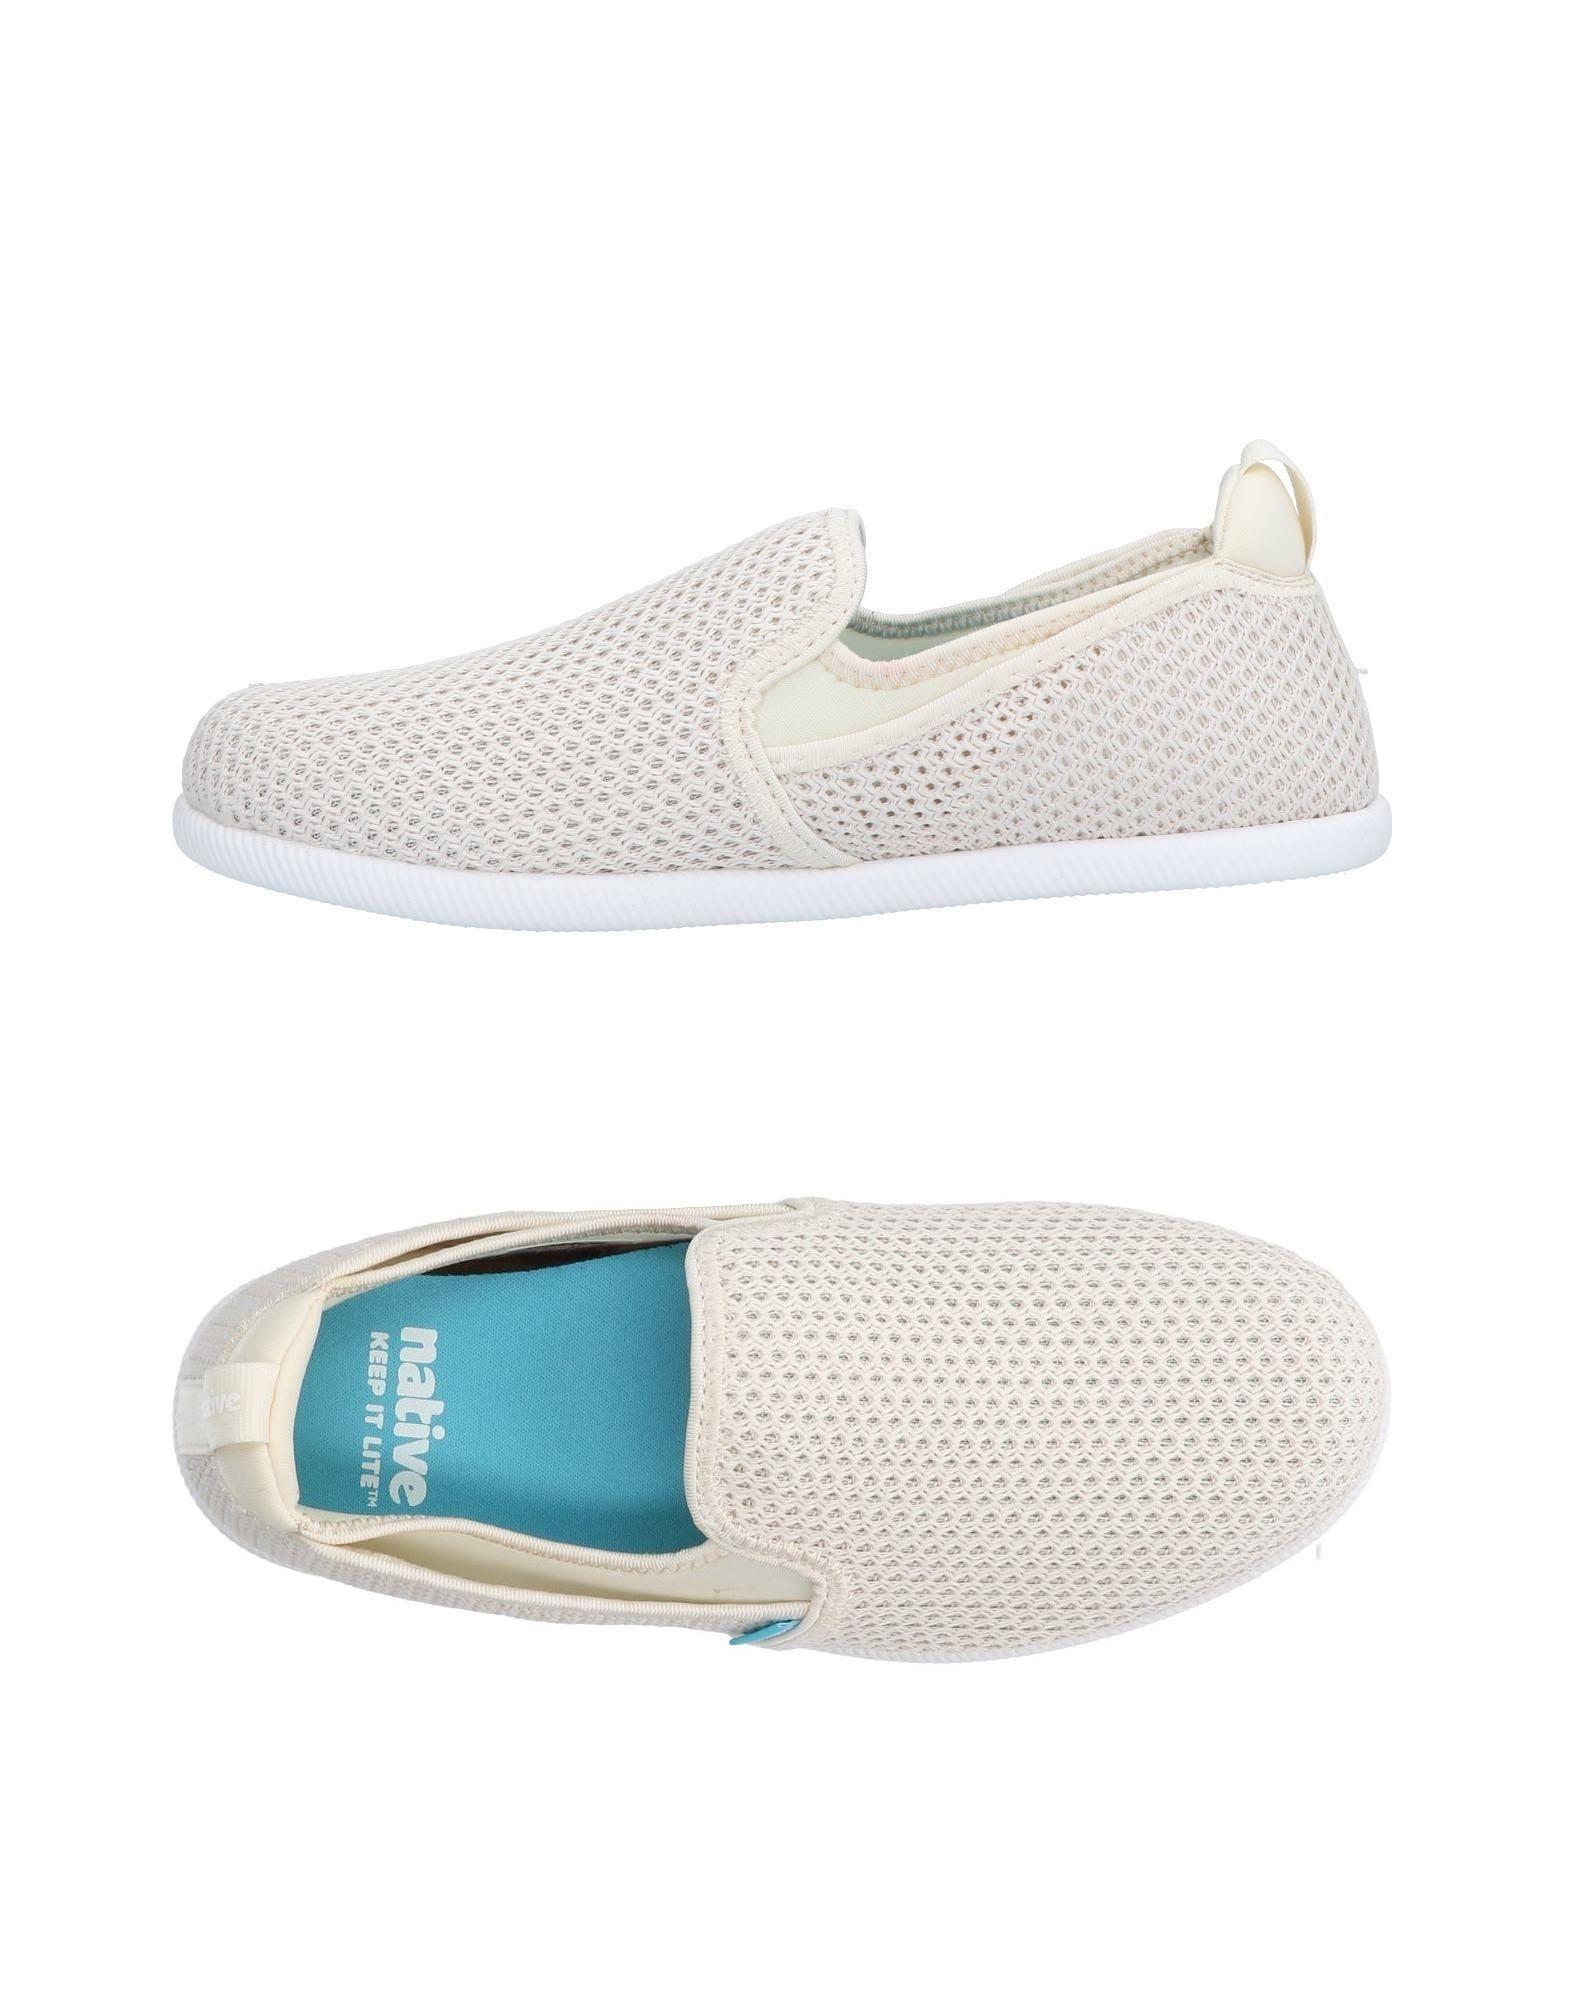 NATIVE Sneakers in Beige